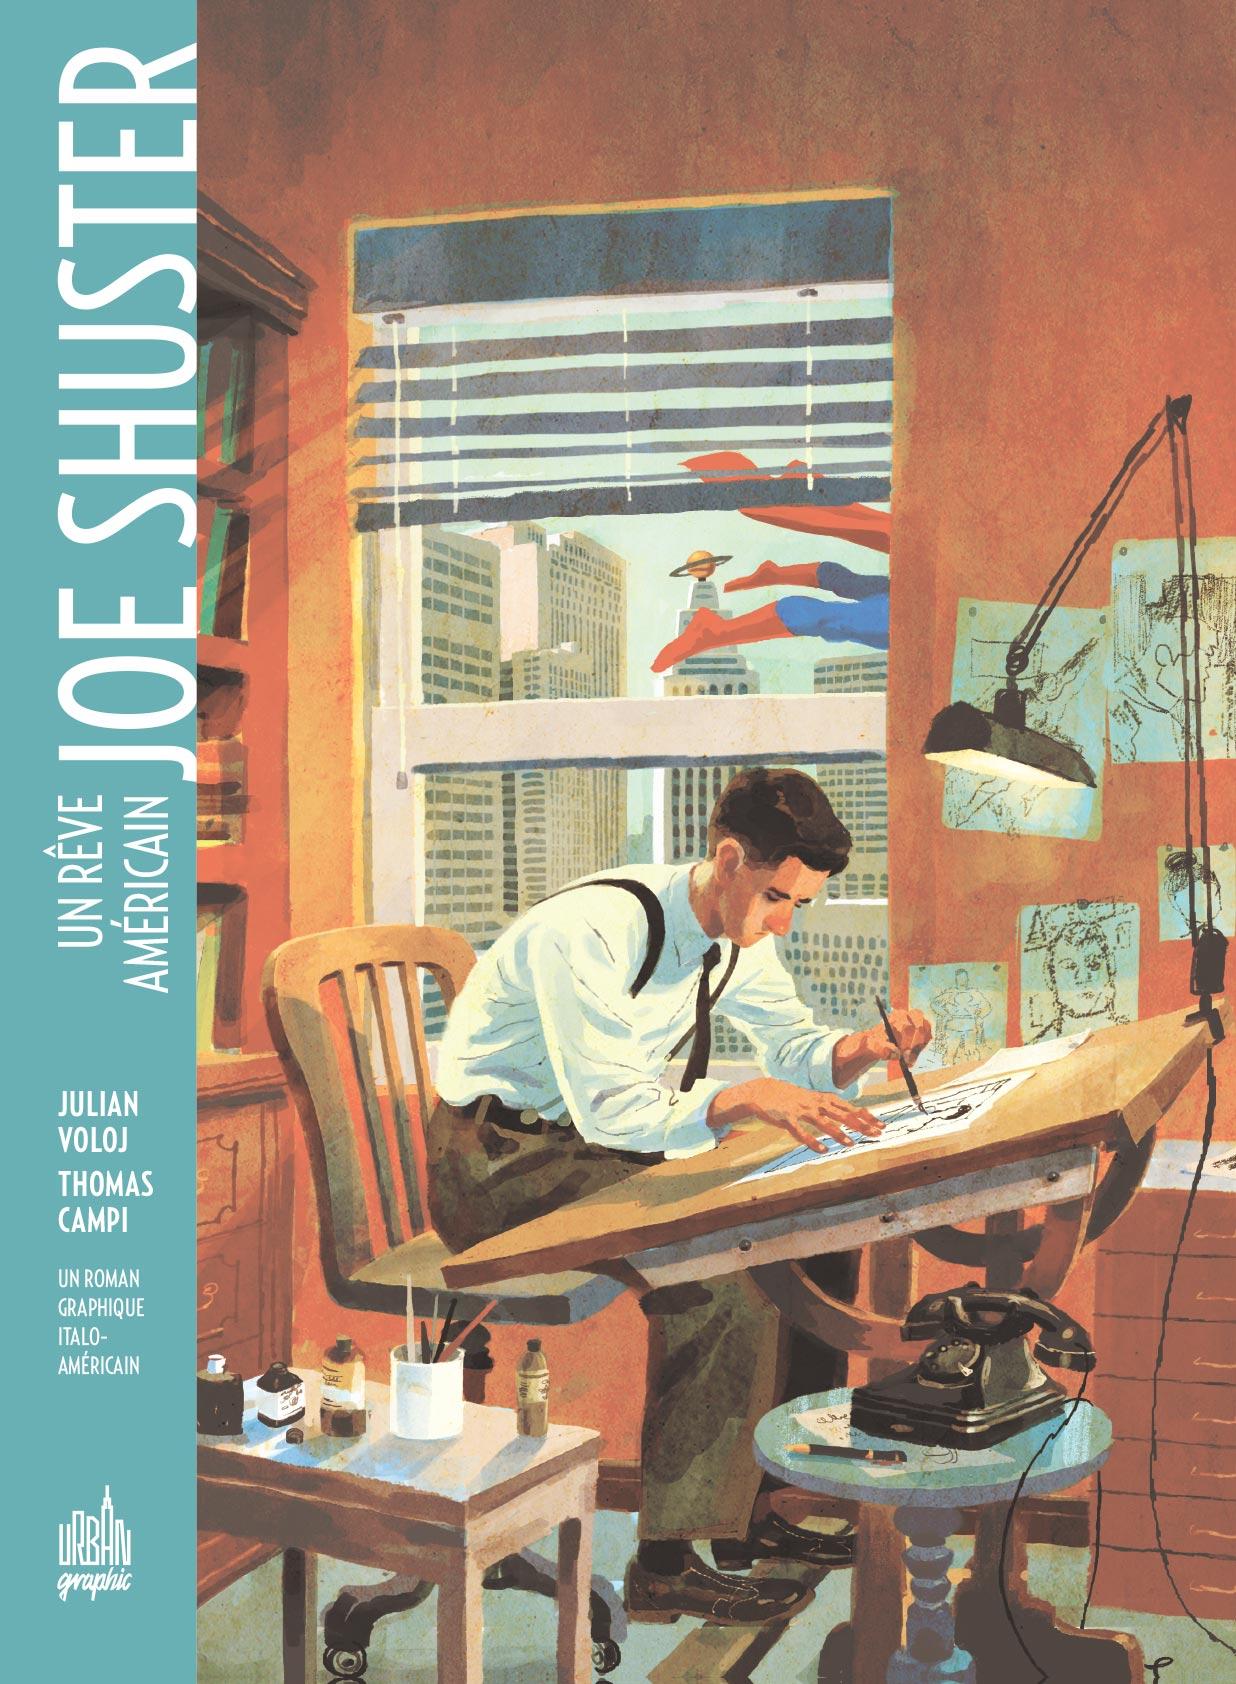 joe-shuster-comics-volume-1-tpb-hardcover-cartonnee-306642